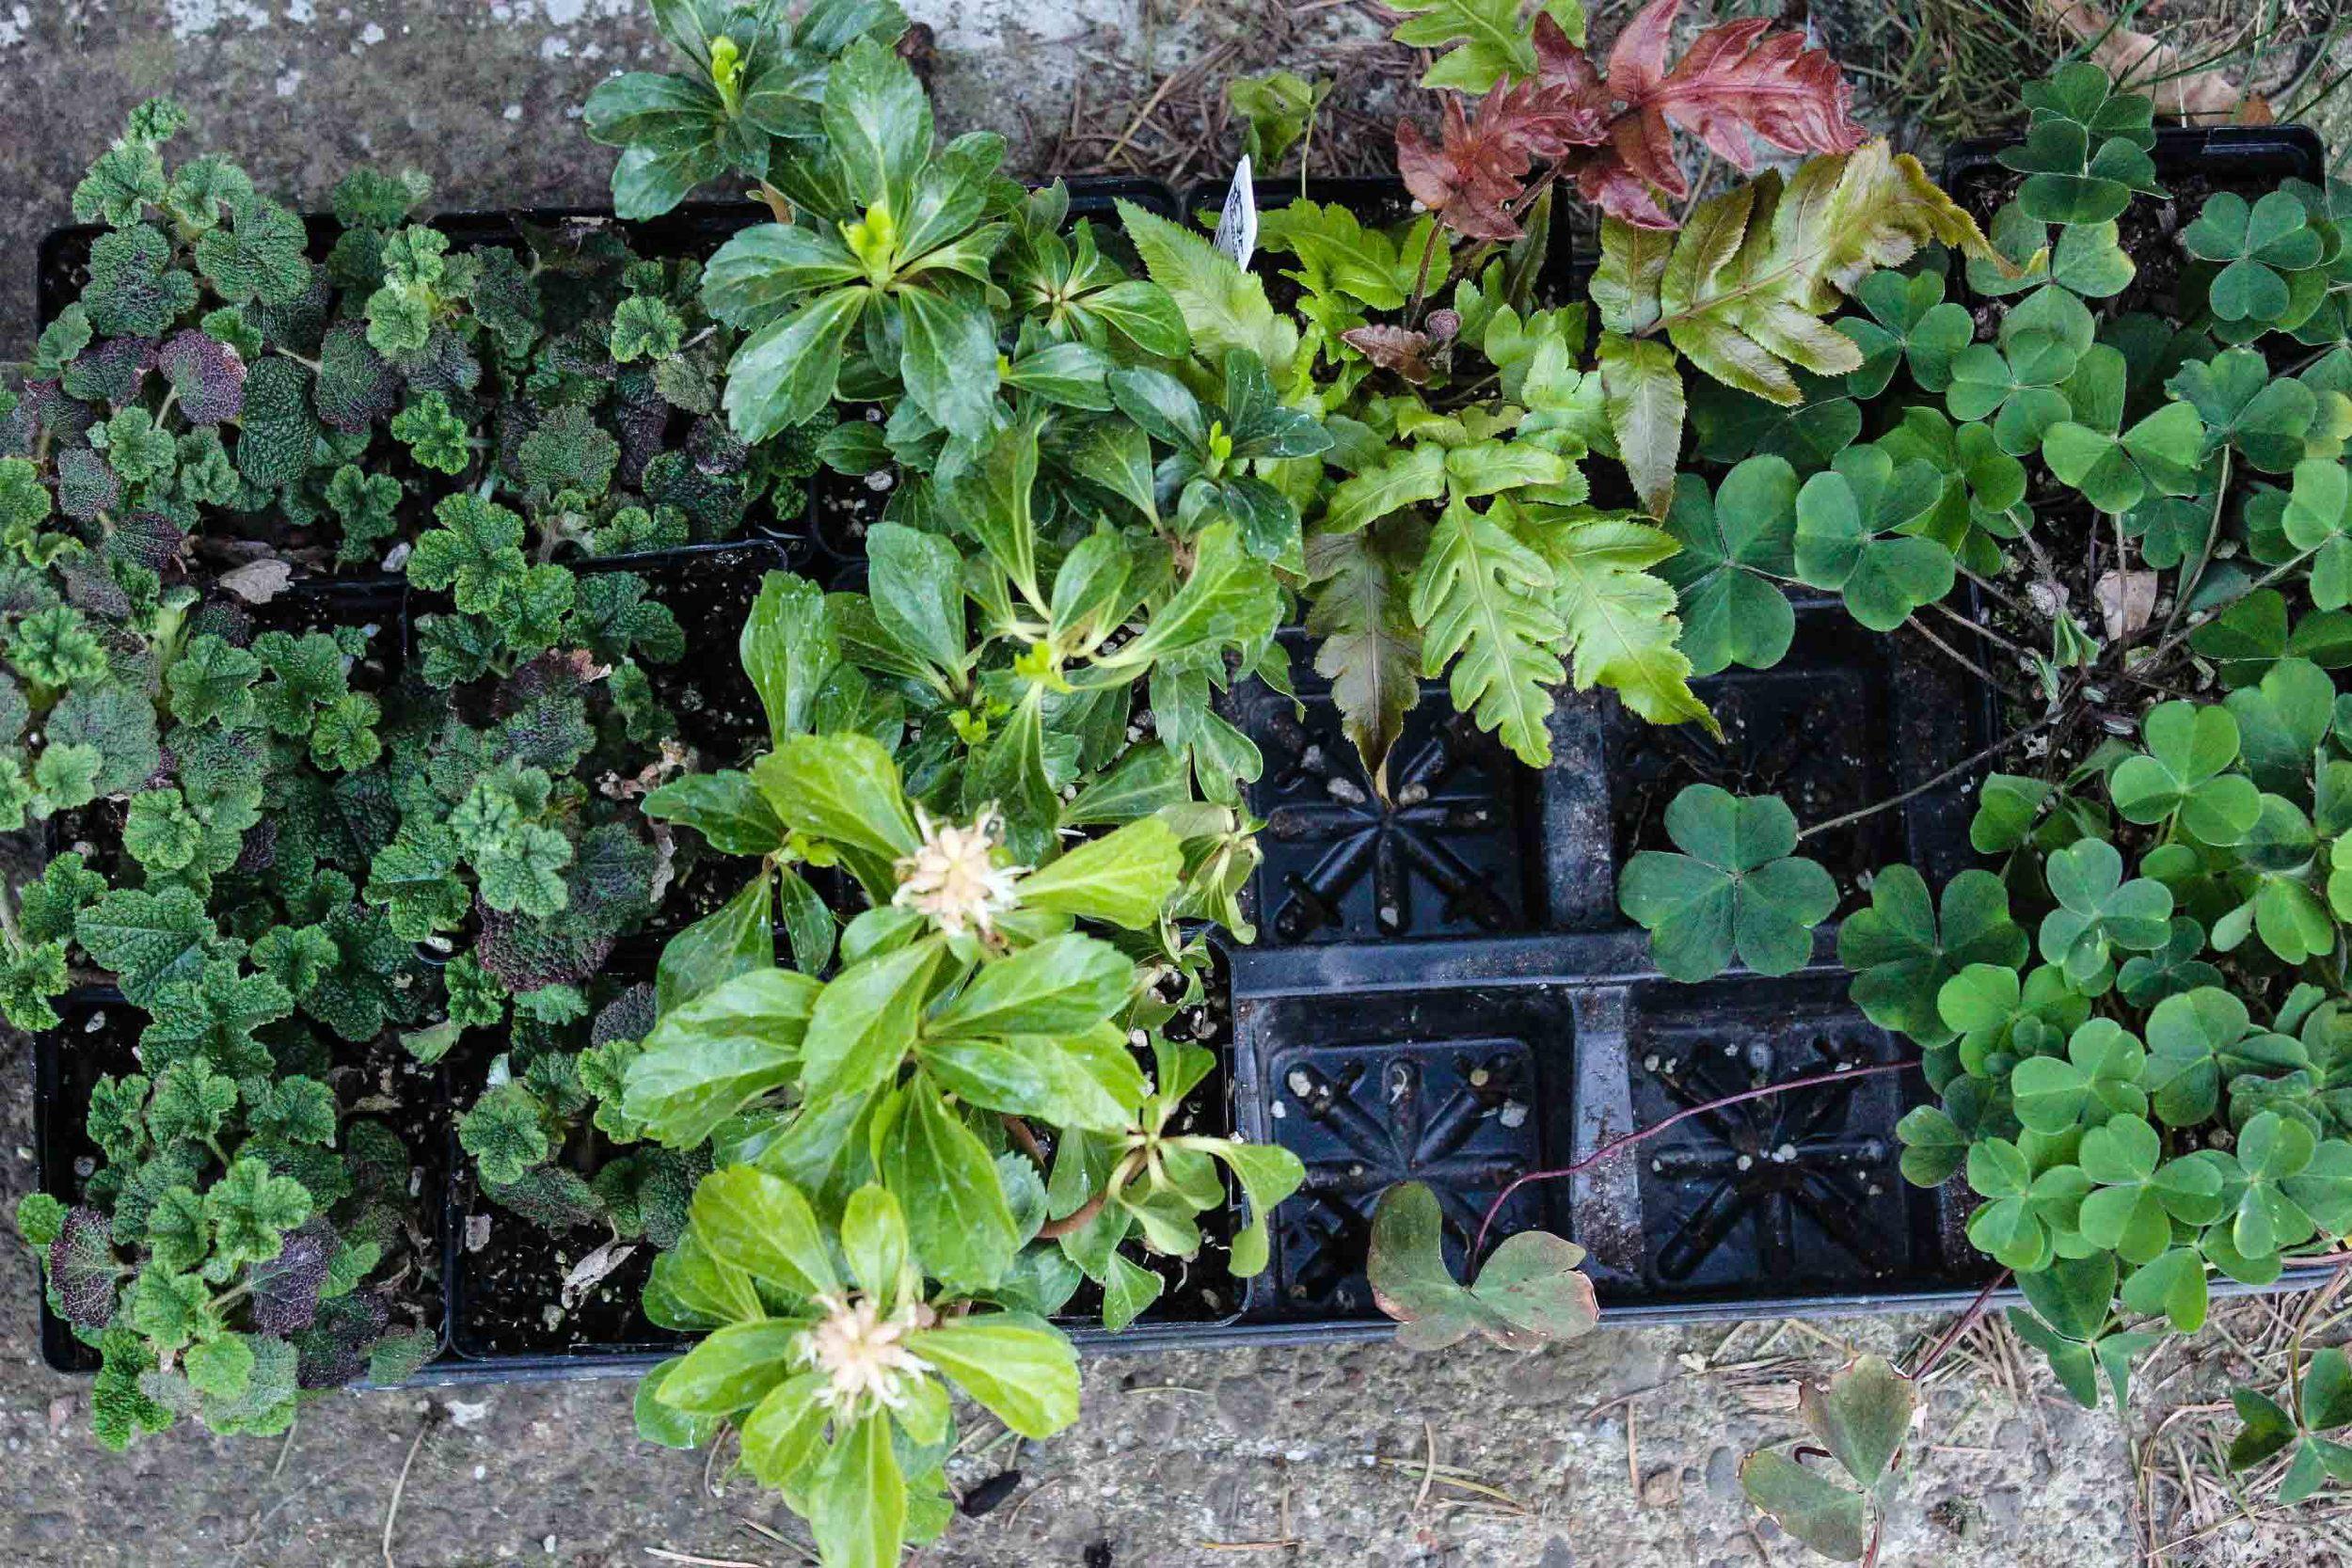 my purchases (left-right)Rubus pentalobus, Pachysandra terminalis, Woodwardia unigemmata, Oxallis oregano